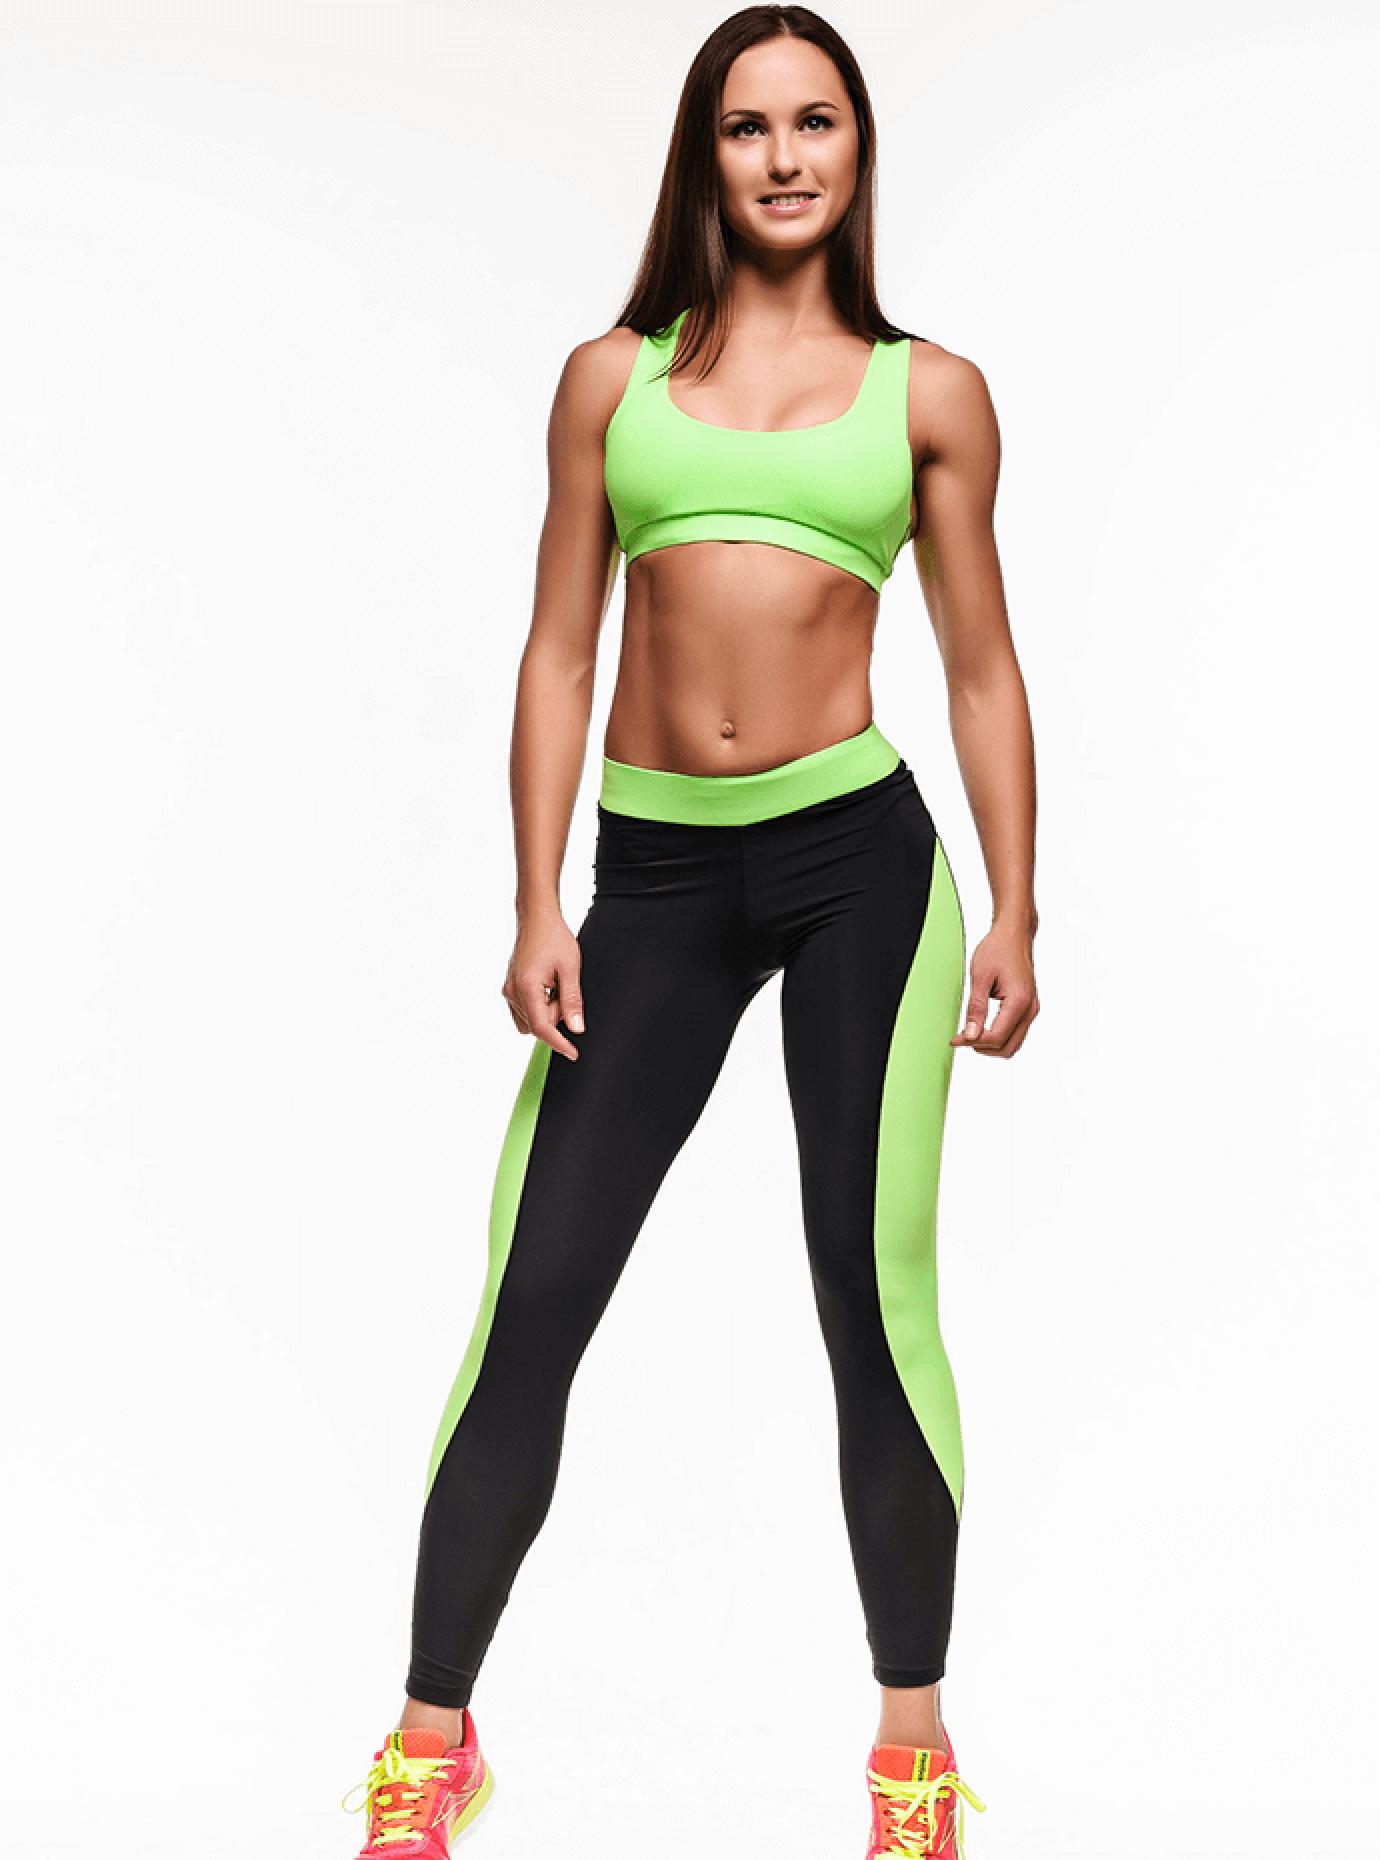 Комплект женский Basic Green Leggings Серый S (01-F171095): фото - Alster.ua